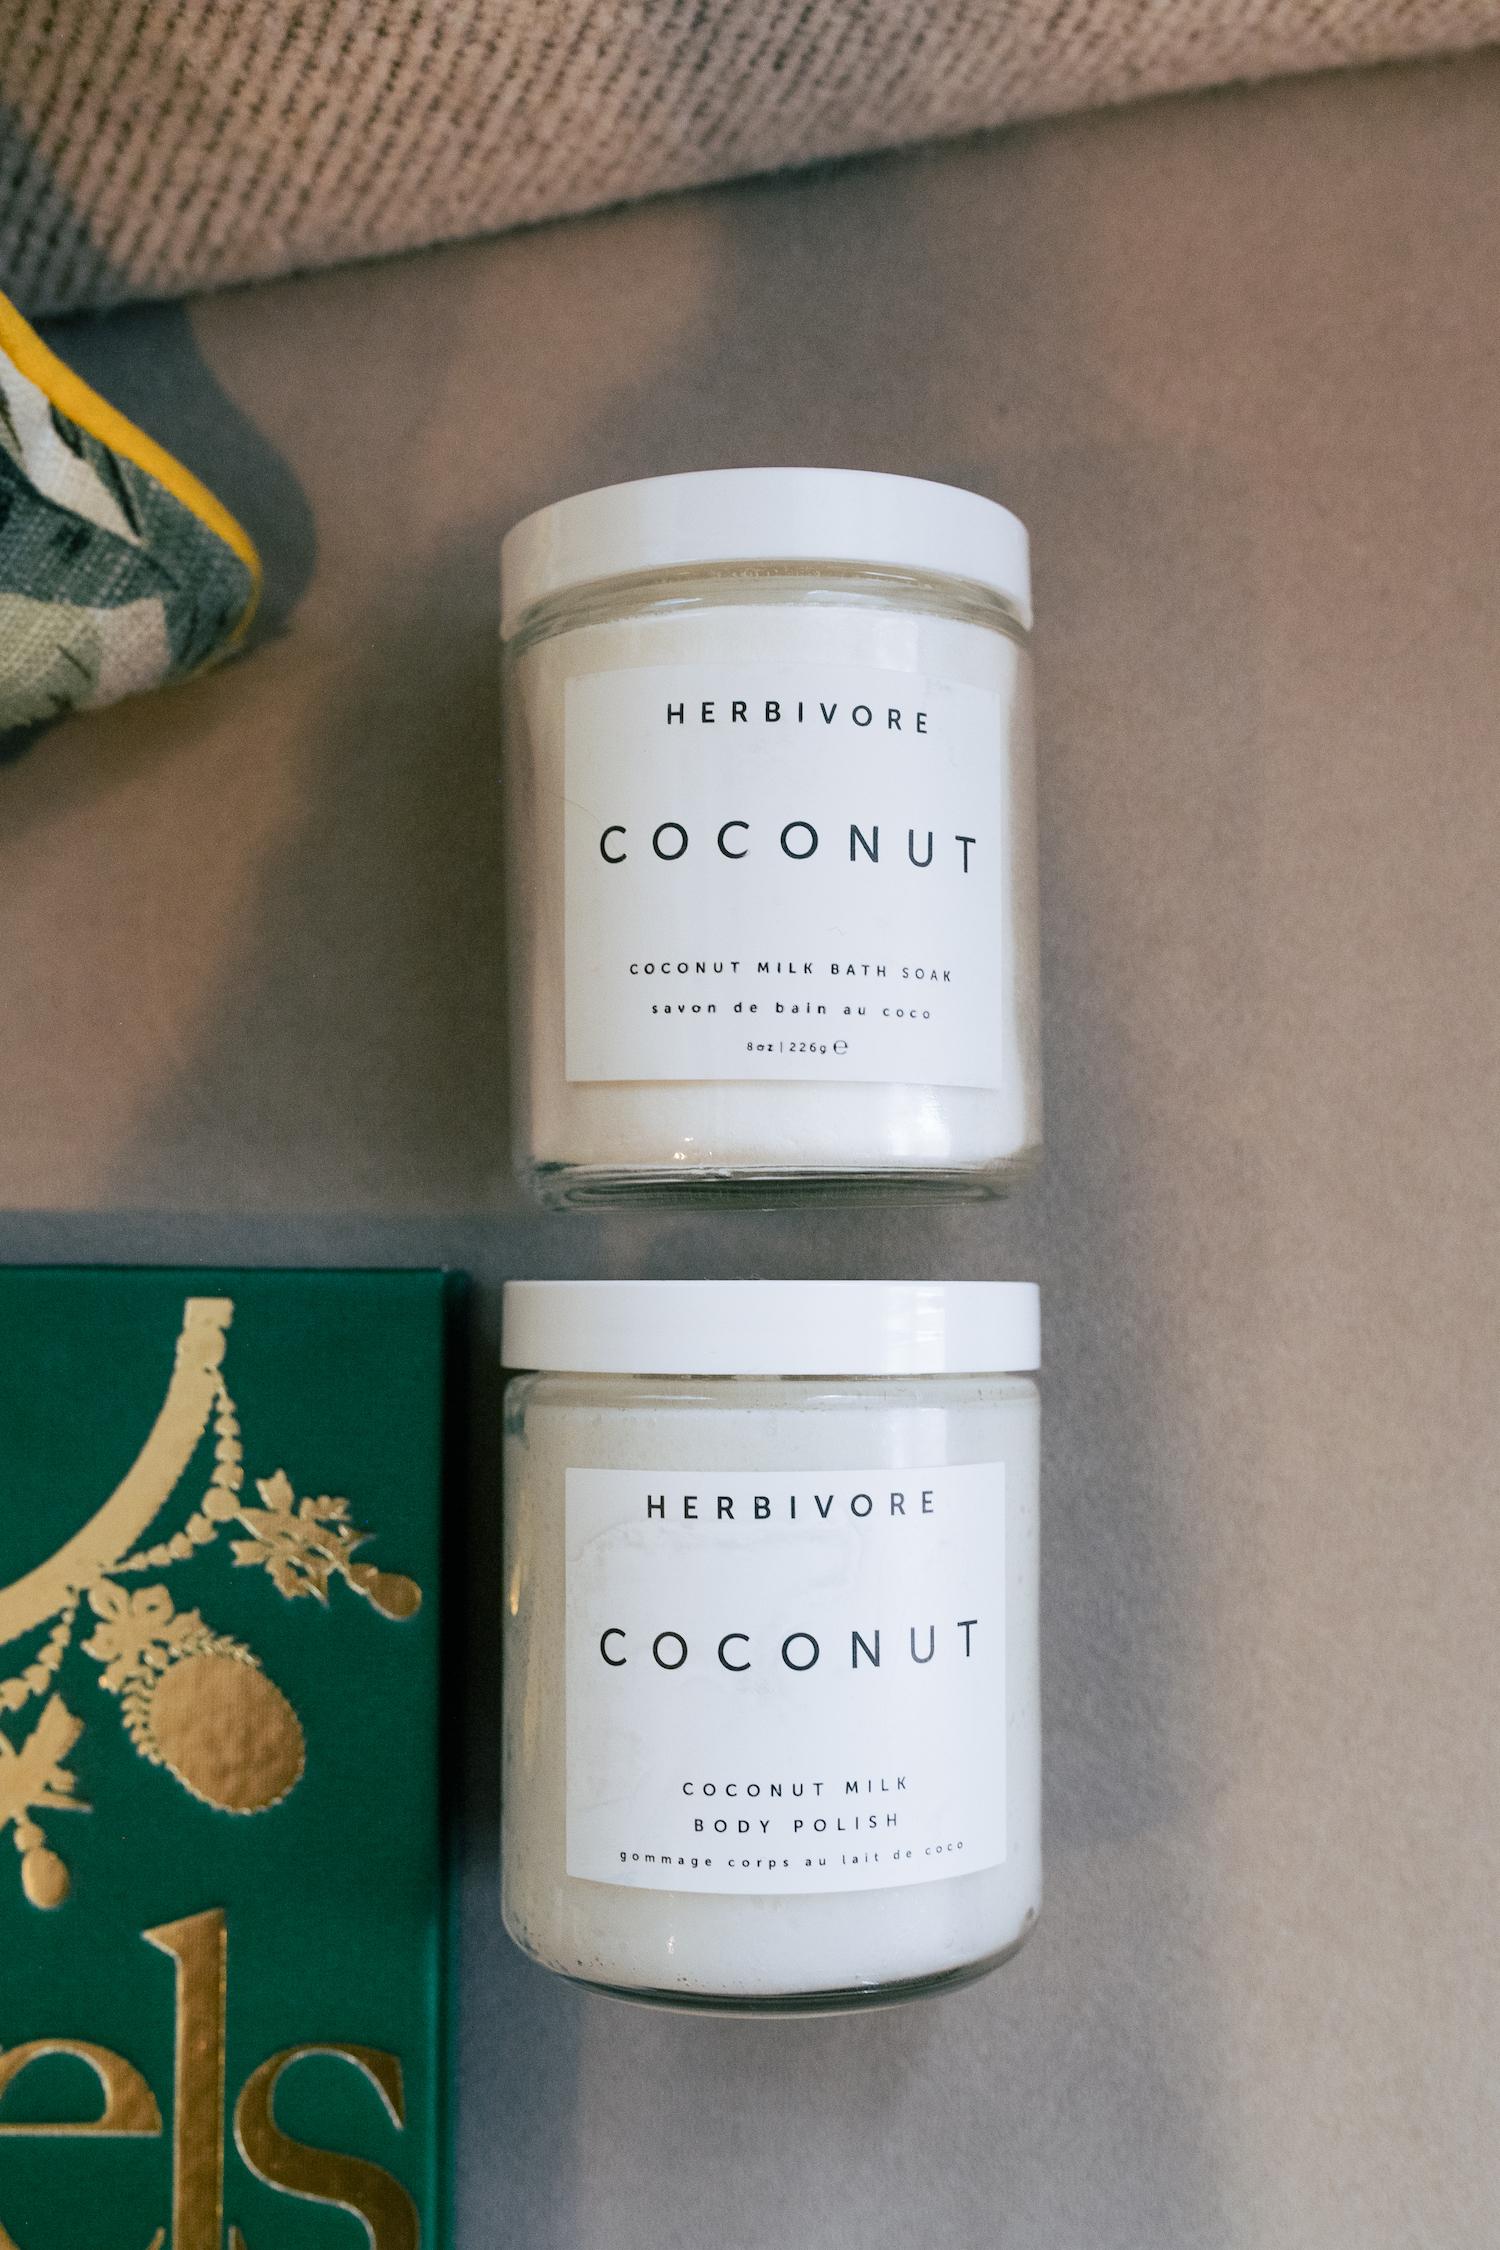 Herbivore Coconut Soak + Scrub.